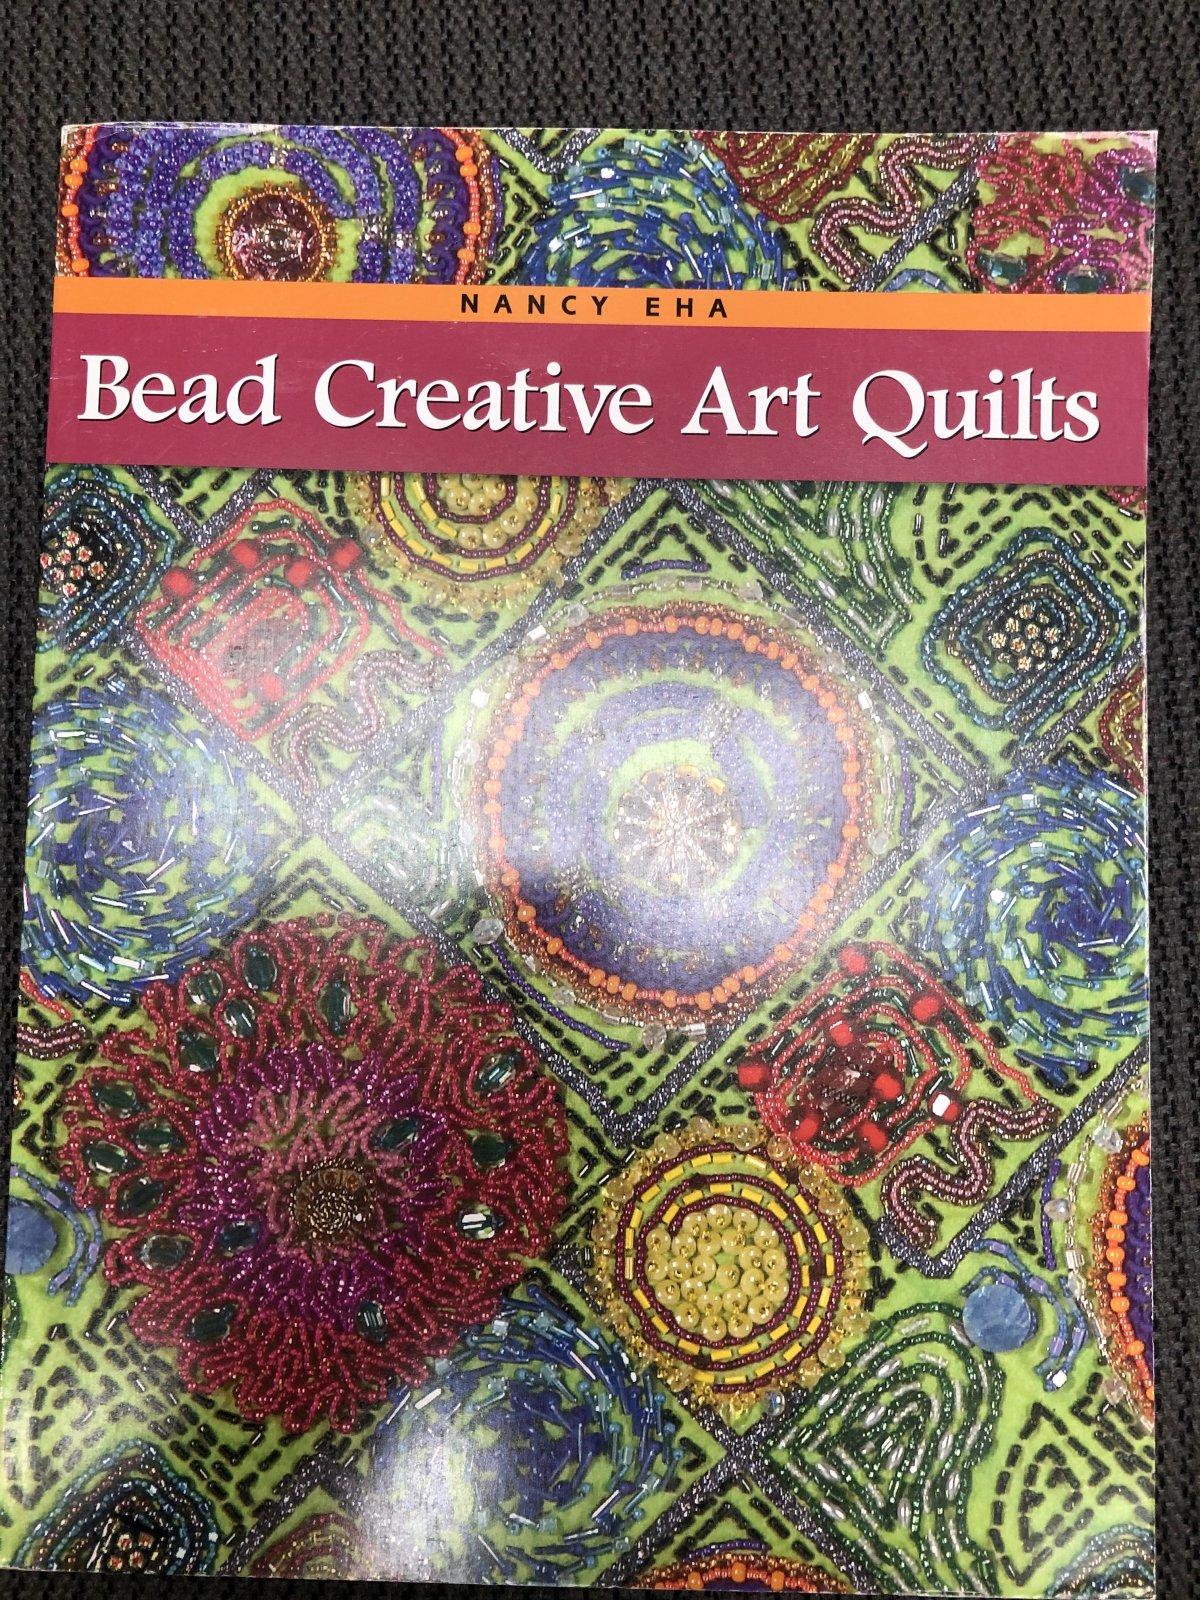 Bead Creative Art Quilts